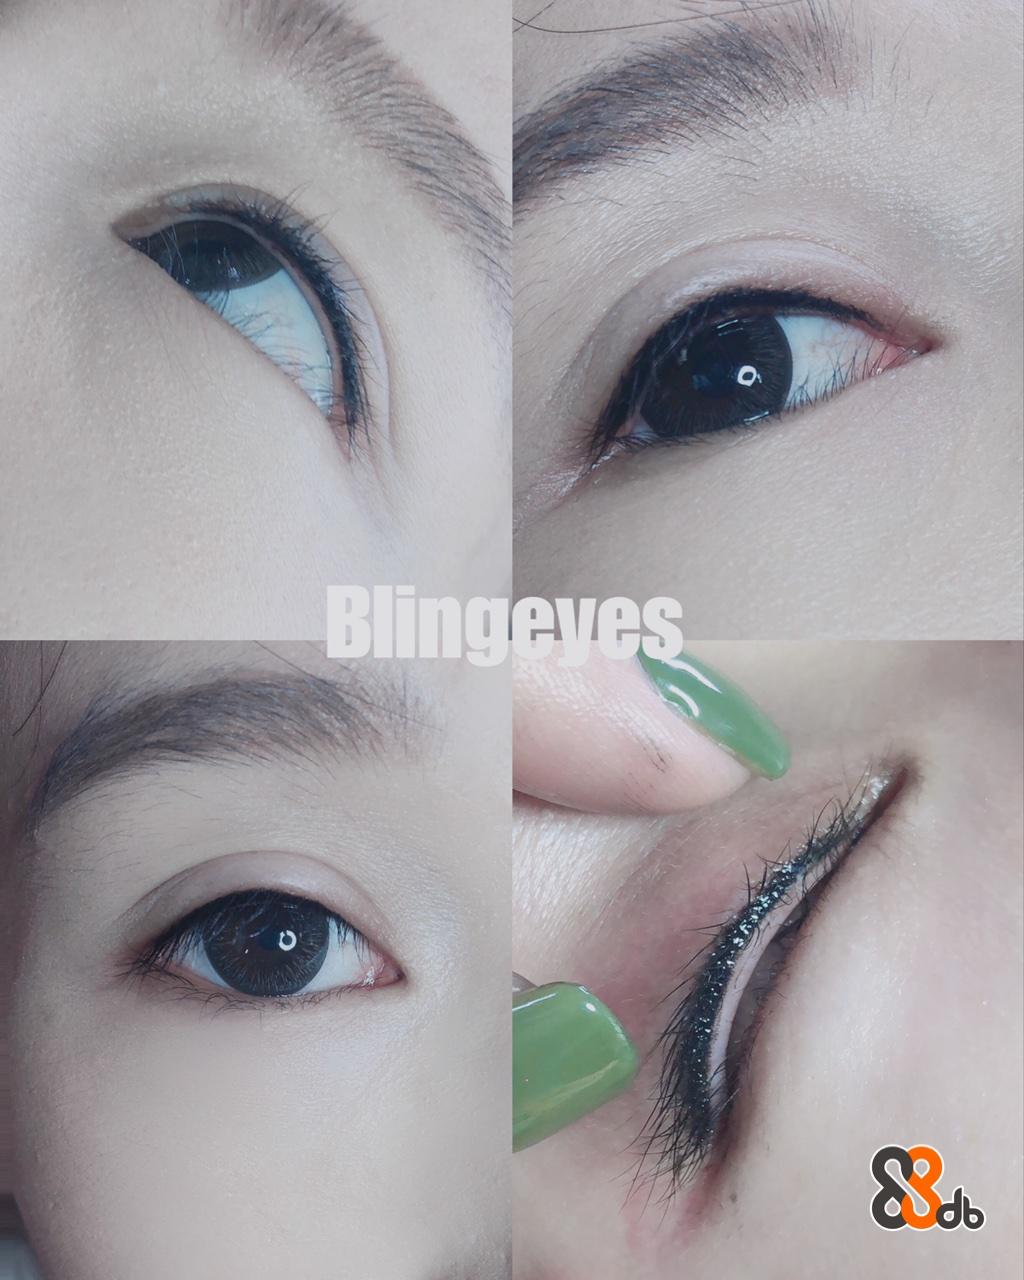 Blingeves  Eyebrow,Eyelash,Face,Eye,Green